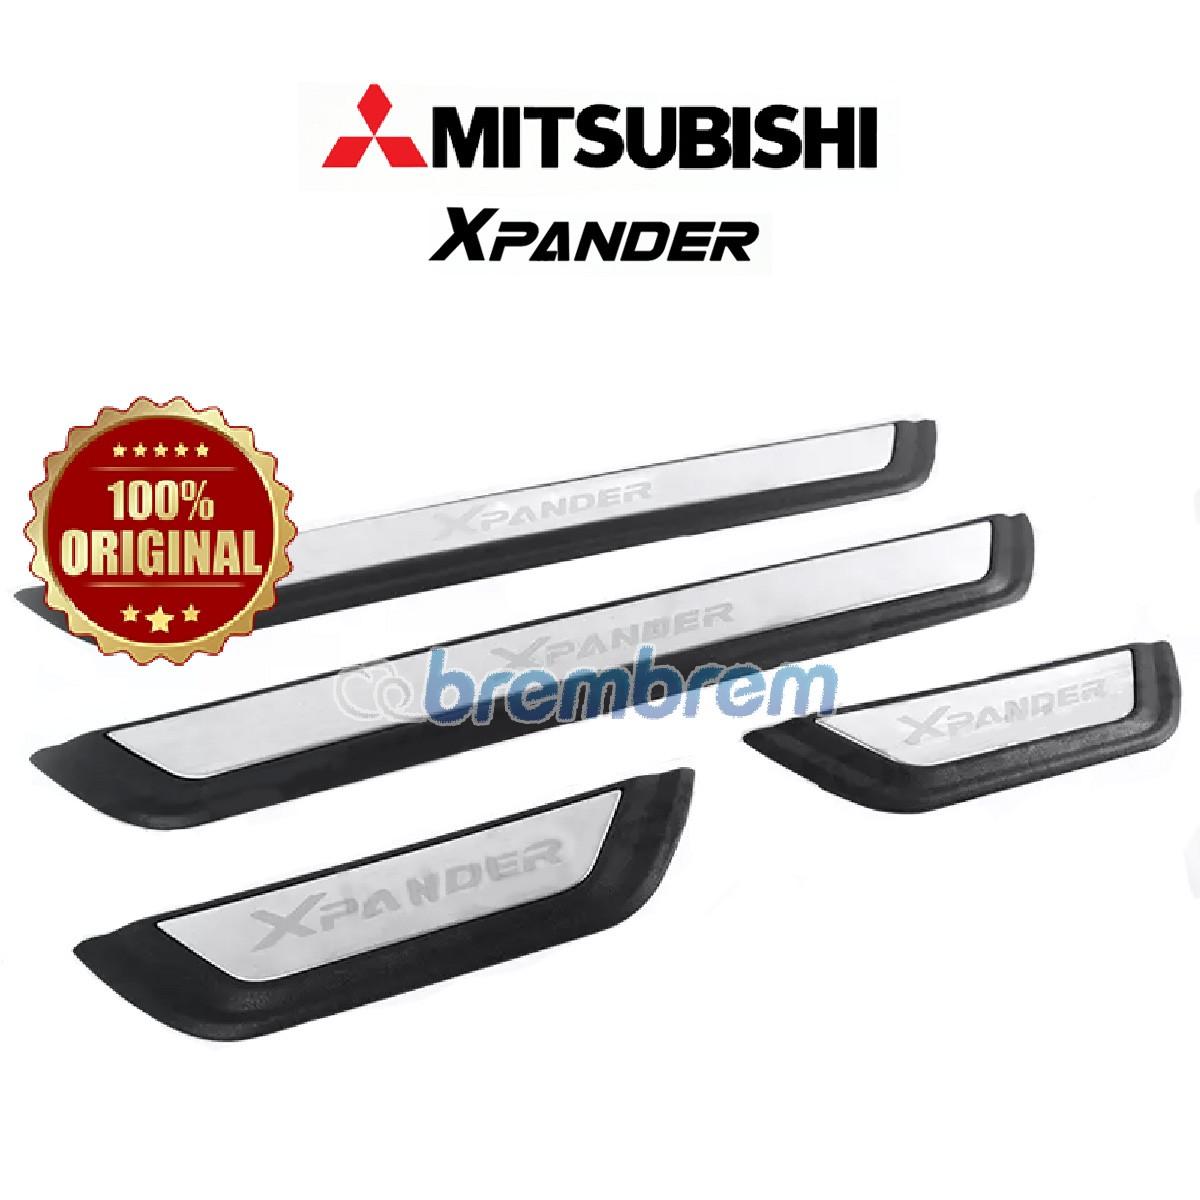 SILLPLATE MITSUBISHI XPANDER WITH NON LAMP